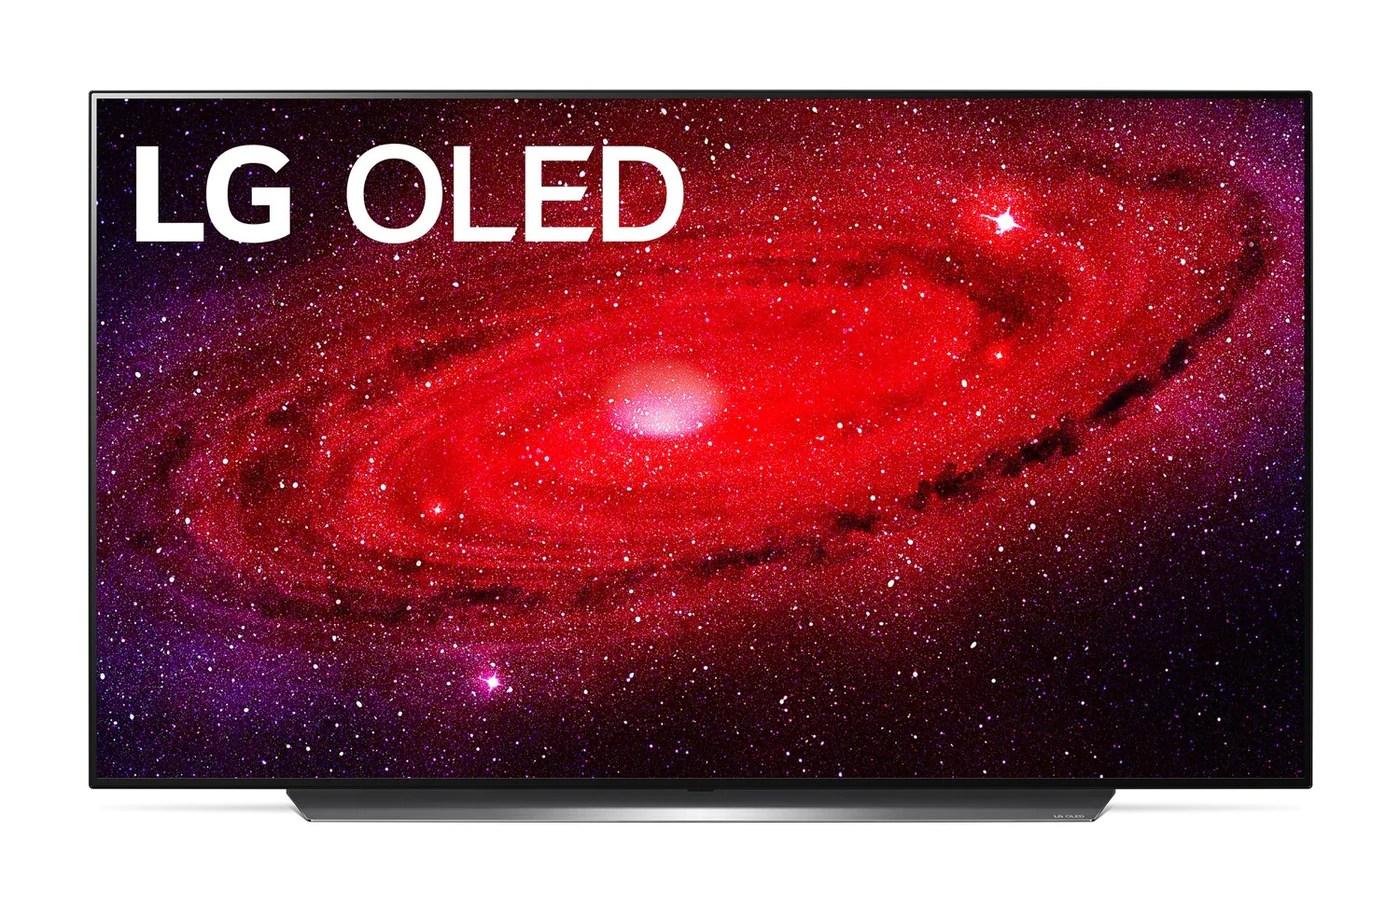 lg 55 cx oled 4k uhd tv with magic remote oled55cxpua